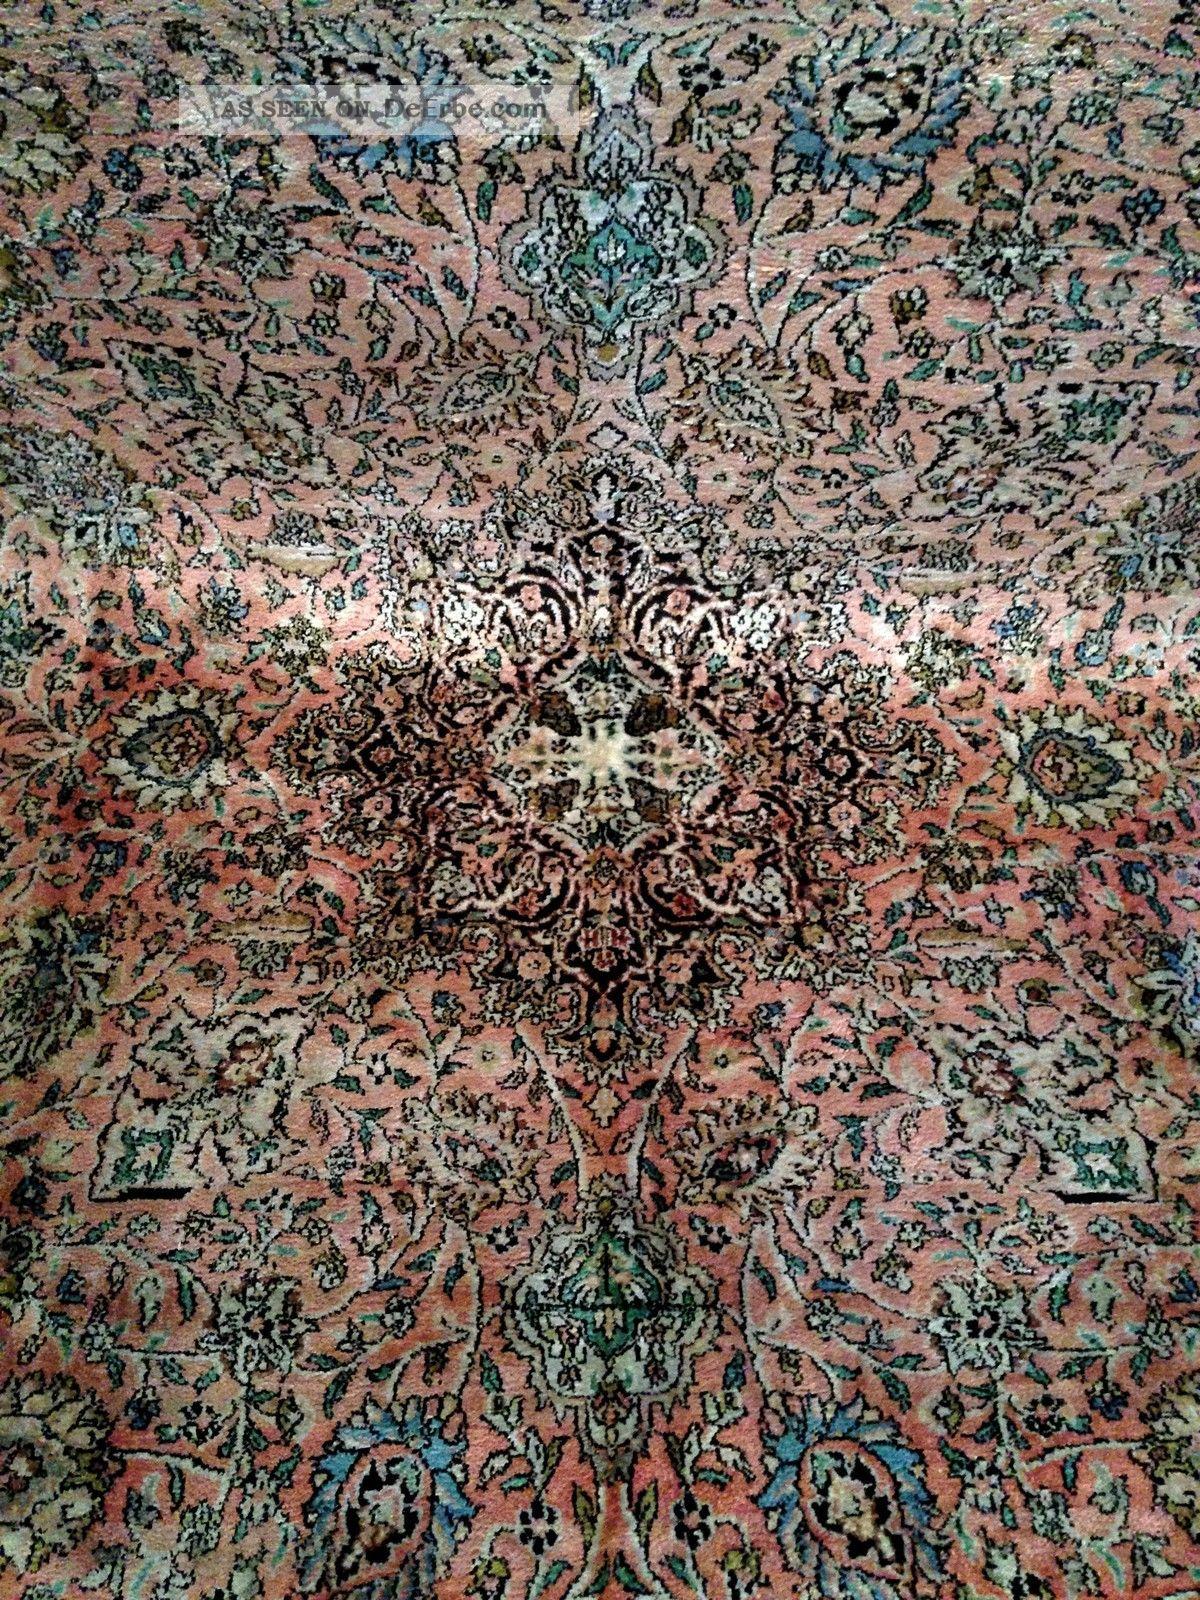 teppich handgekn pft kaschmir seide natur275x175cm carpet tappeto tapis top12000. Black Bedroom Furniture Sets. Home Design Ideas